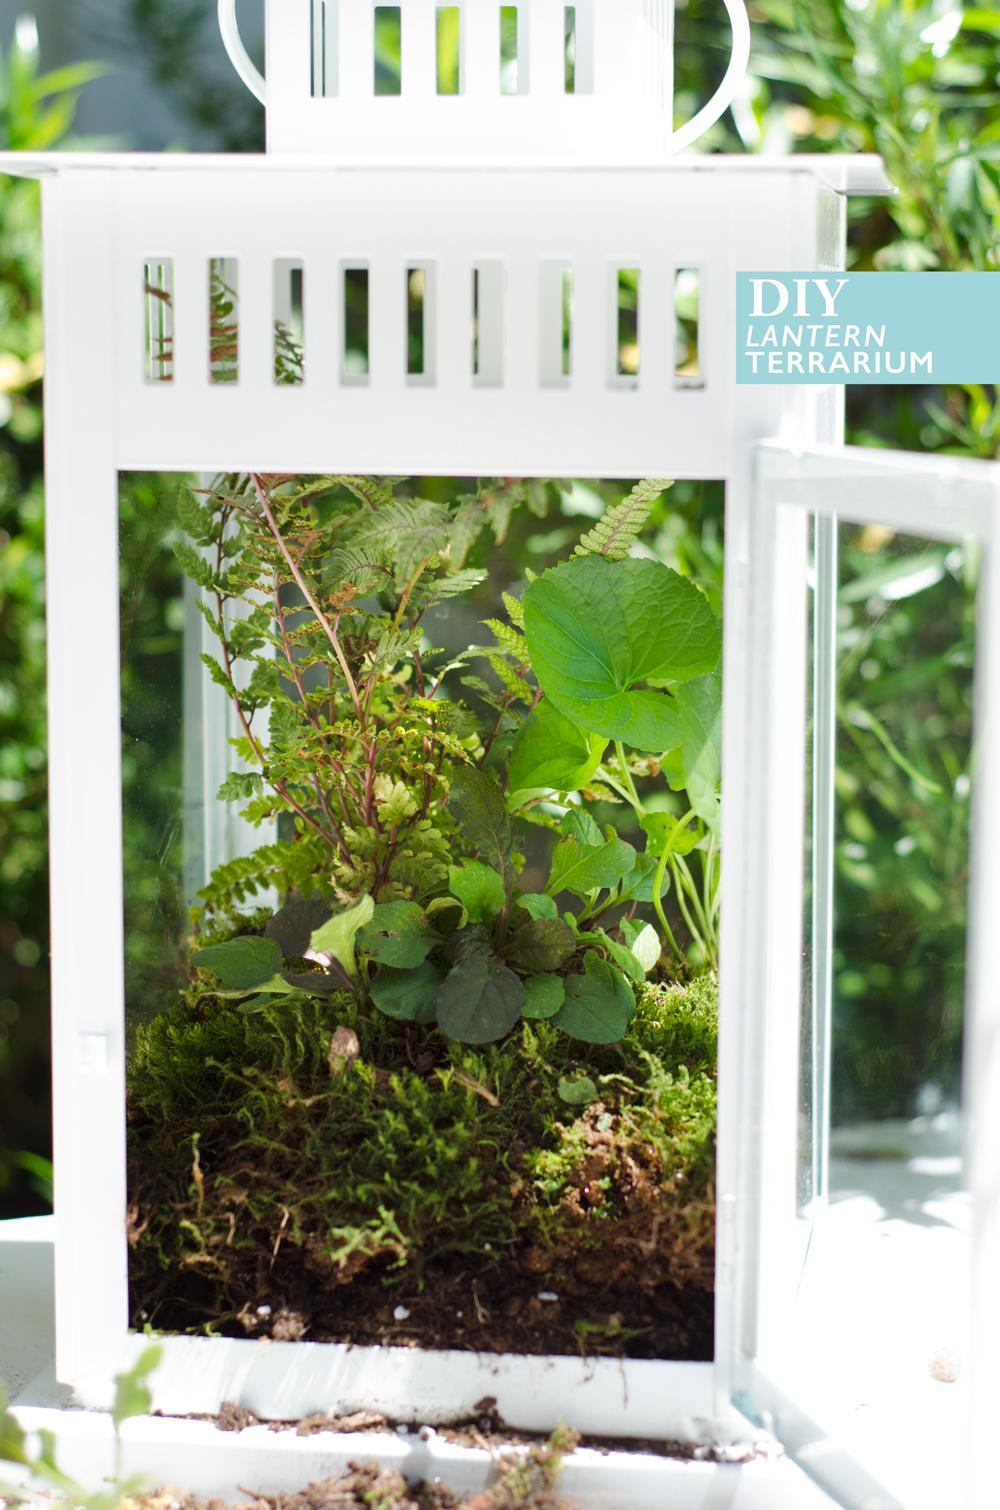 Ikea Hack: #DIY Lantern Terrarium on Thou Swell https://thouswell.com/